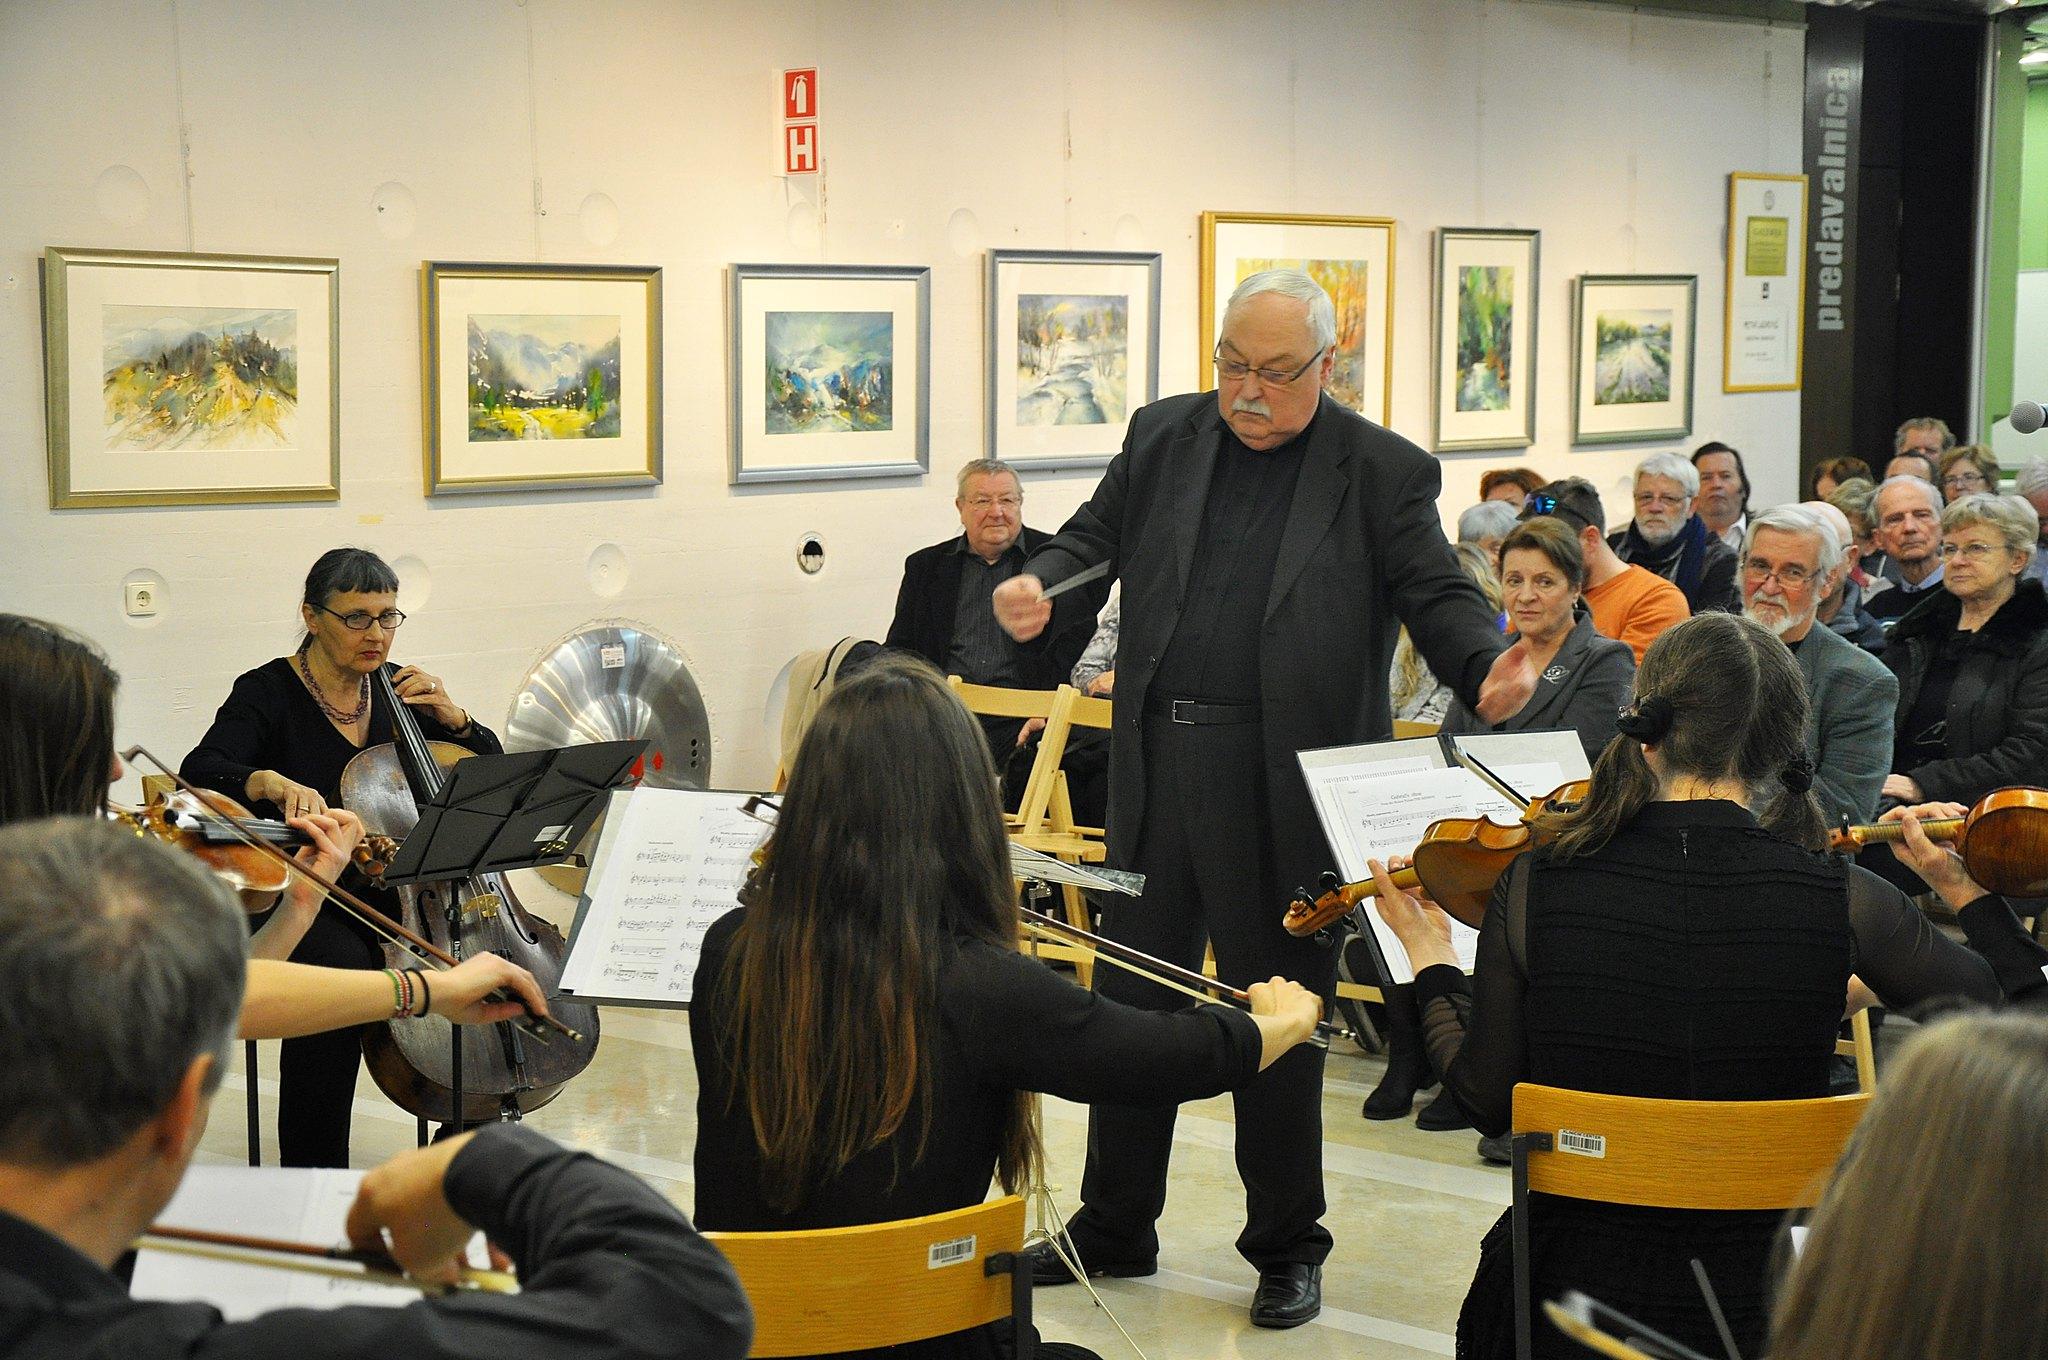 razstava Petra Lazarevića in skupine akvarelistov - KC februar 2 146